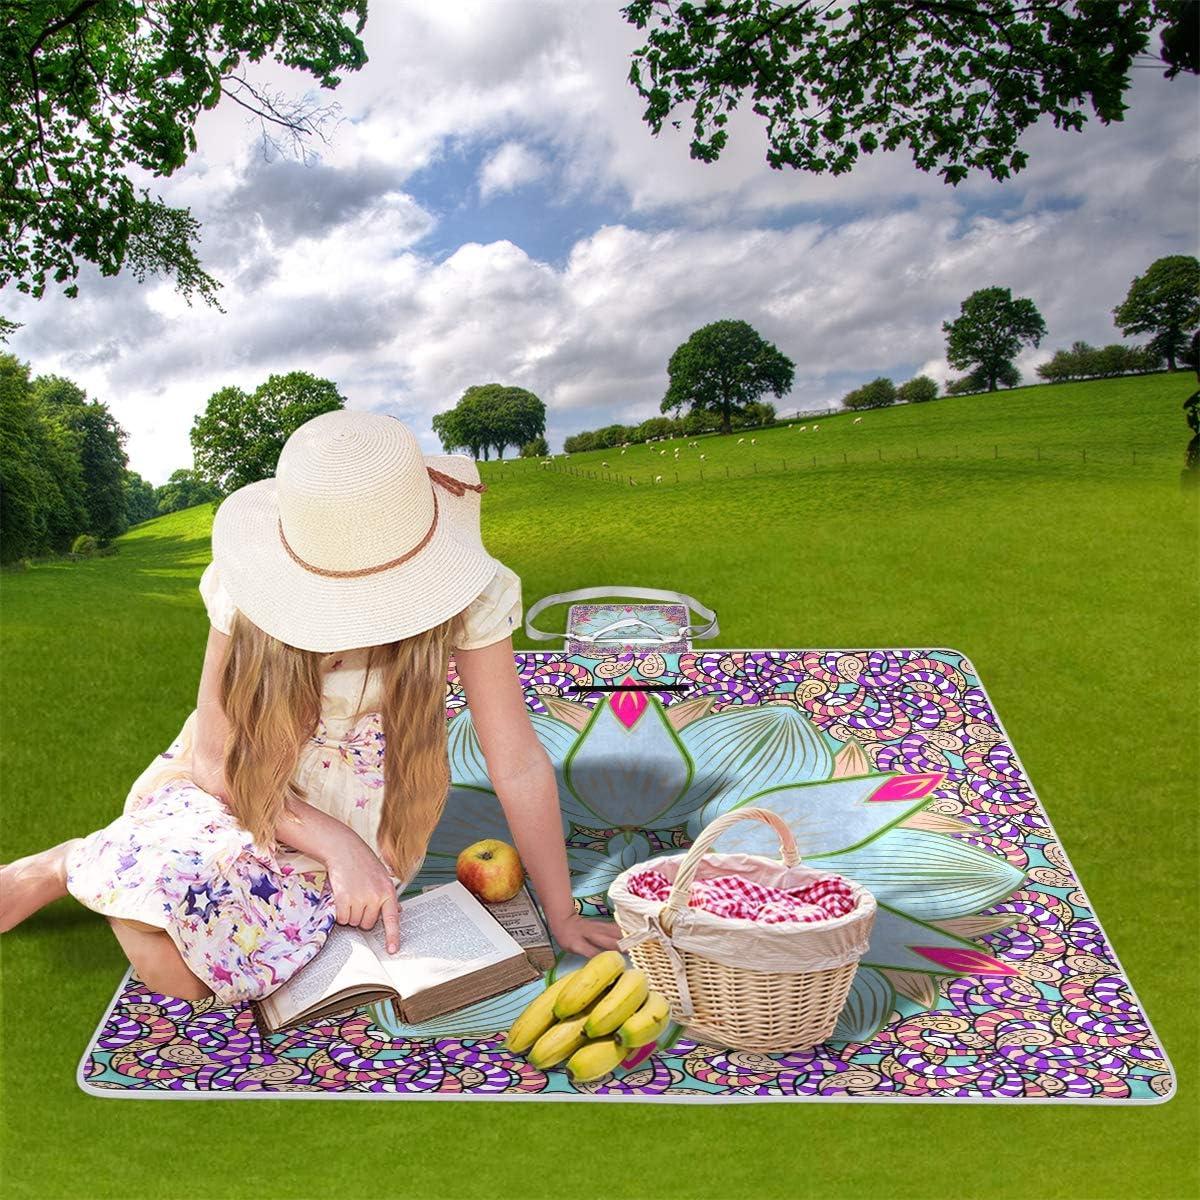 TIZORAX Mandala Picknickdecke Wasserdichte Outdoor Decke faltbar Picknick Handliche Matte Tragetasche f/ür Strand Camping Wandern